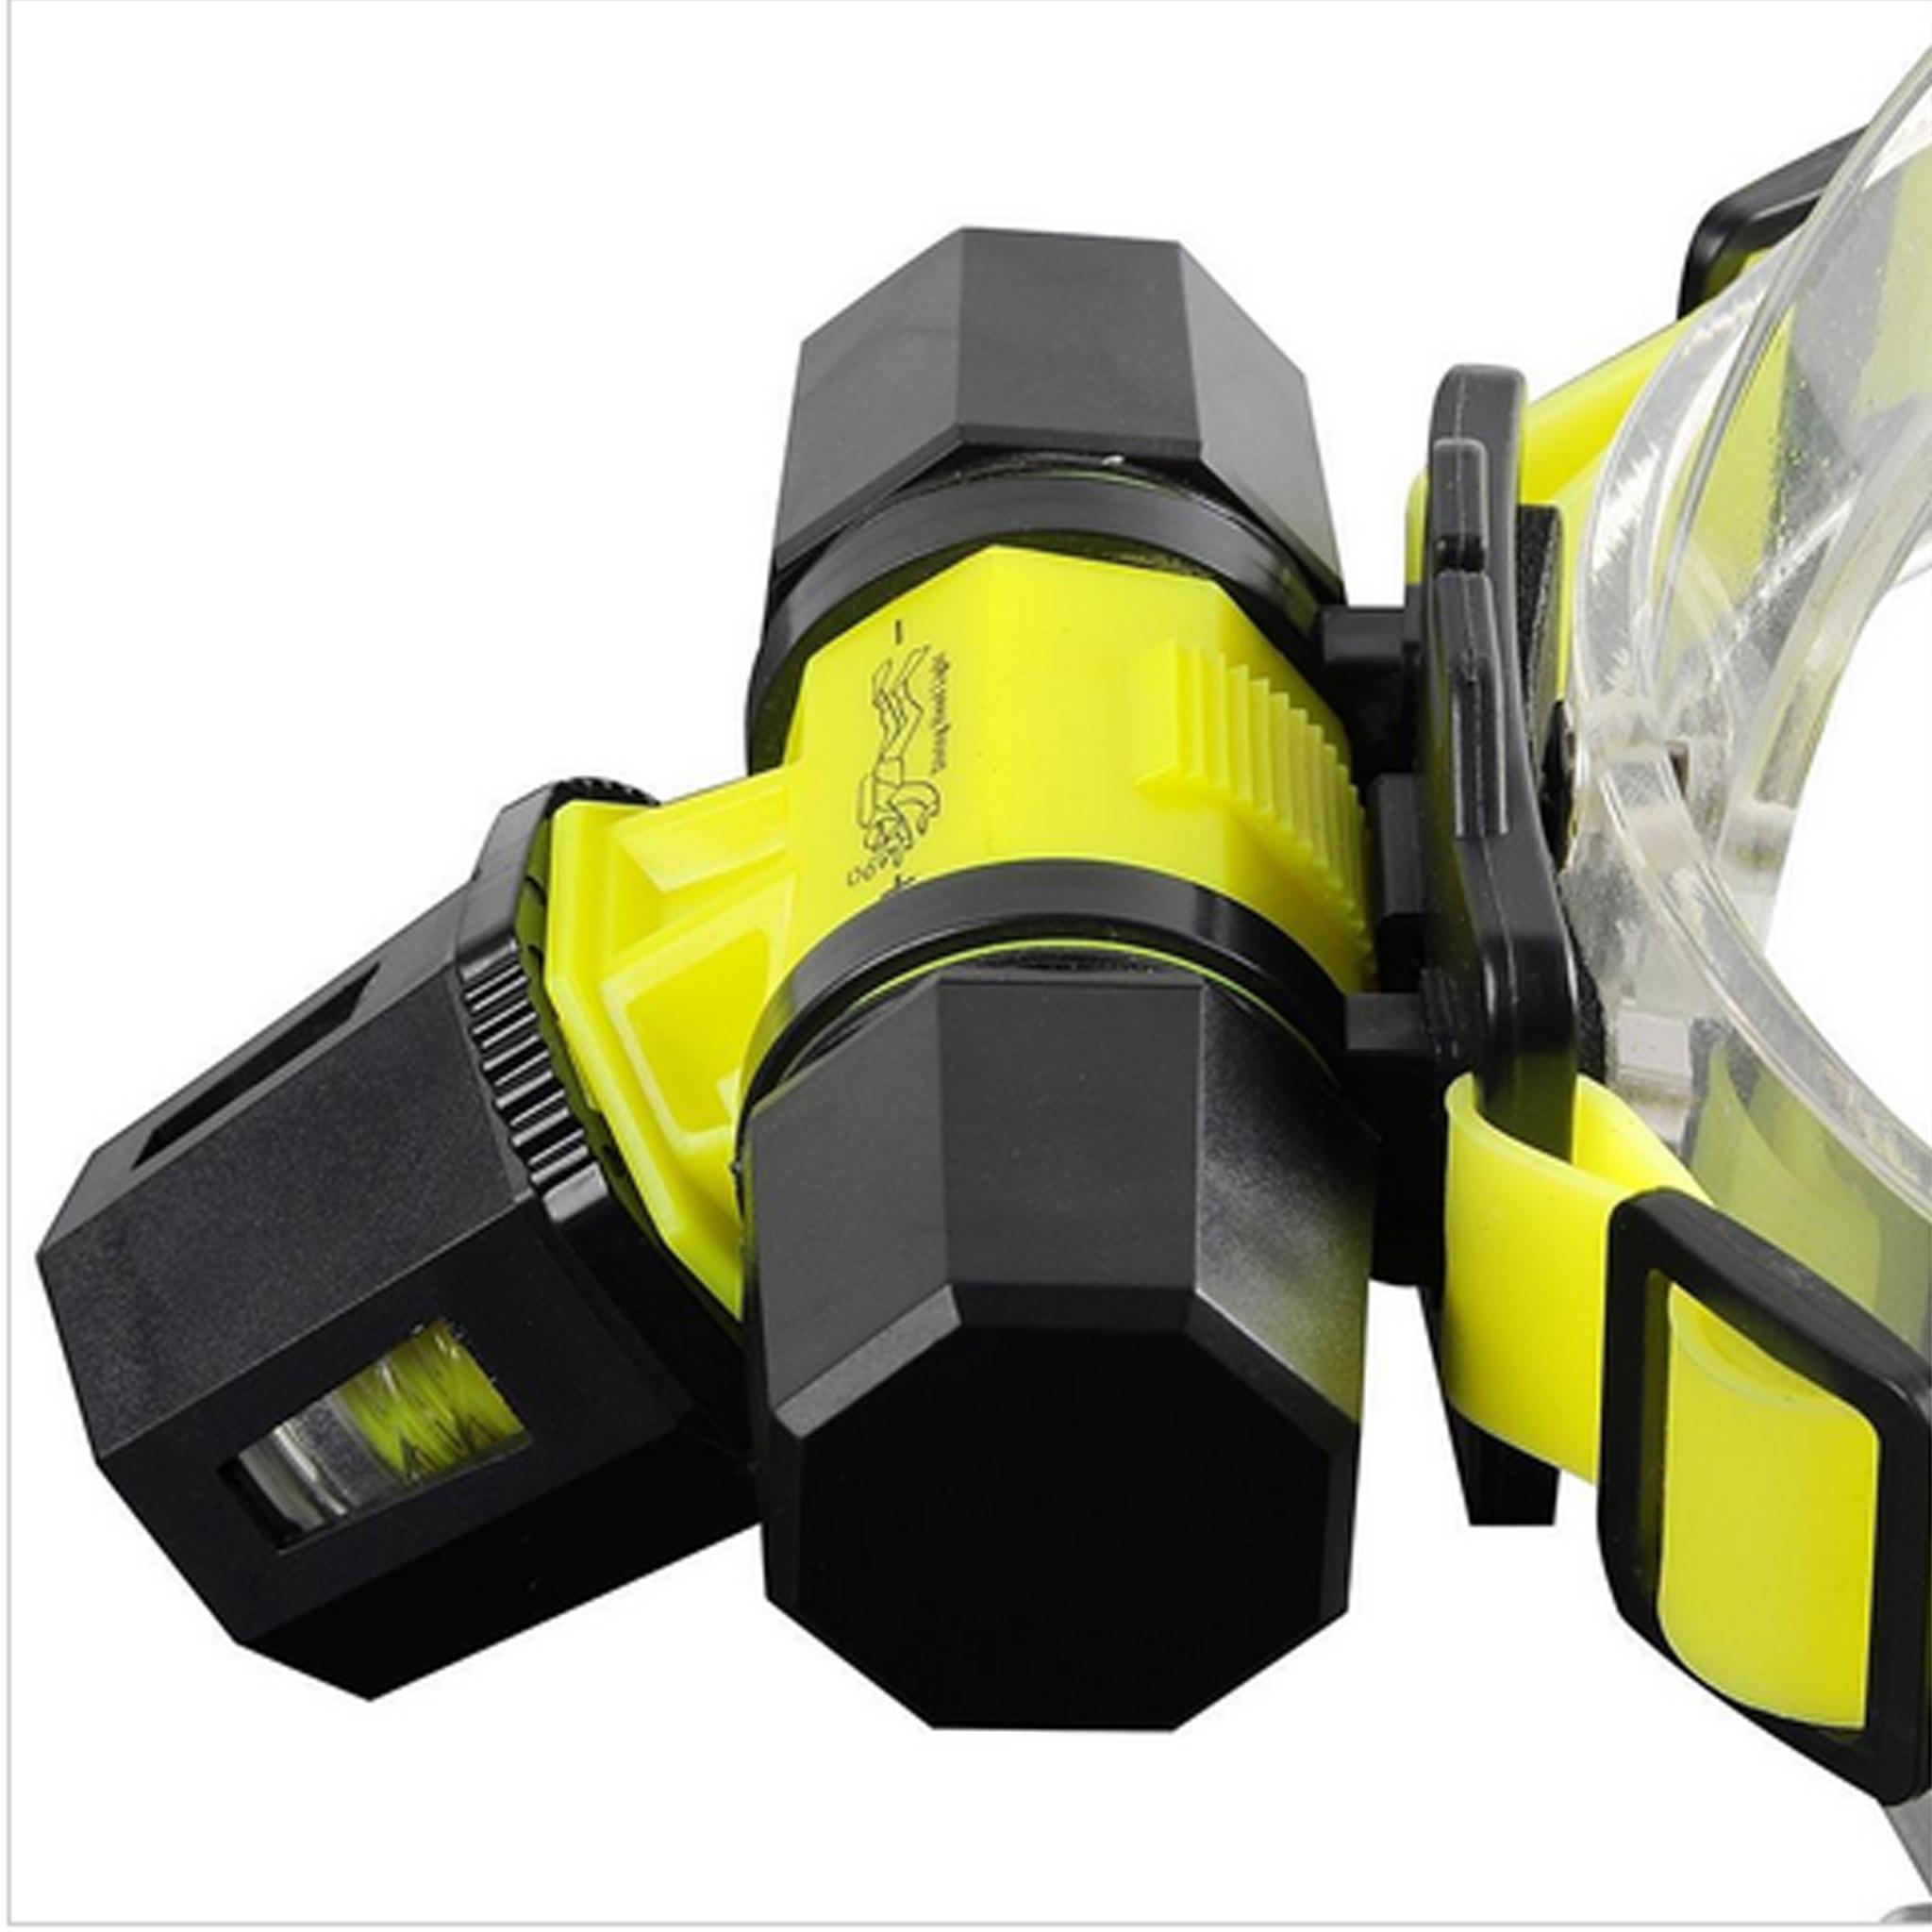 Jual Senter Selam Kepala Dalam Air LED CREE XML-T6 + Zoom + 18650 +